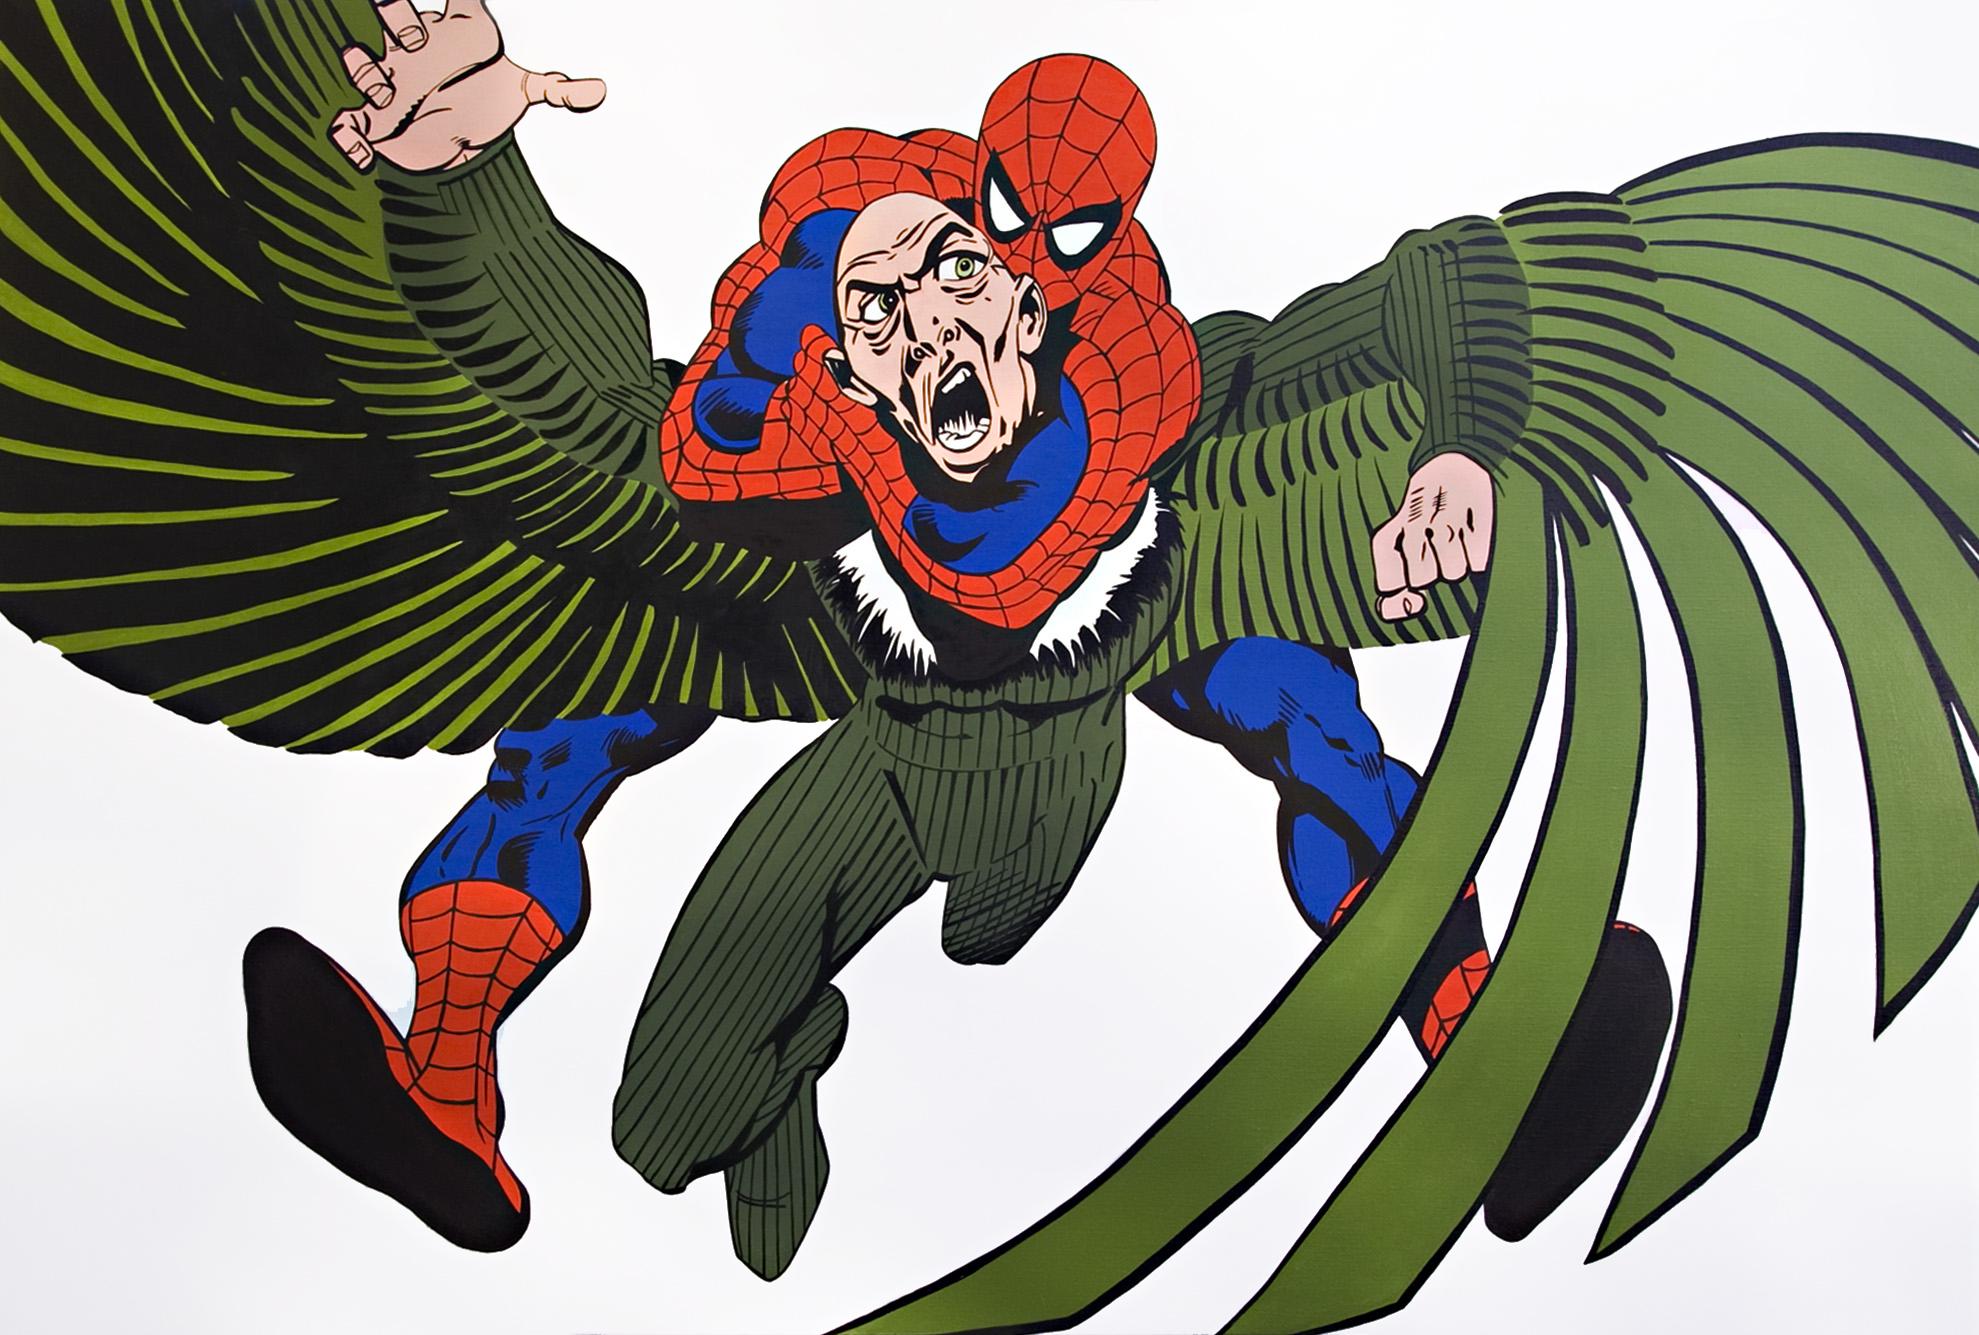 Spiderman 2, 2010